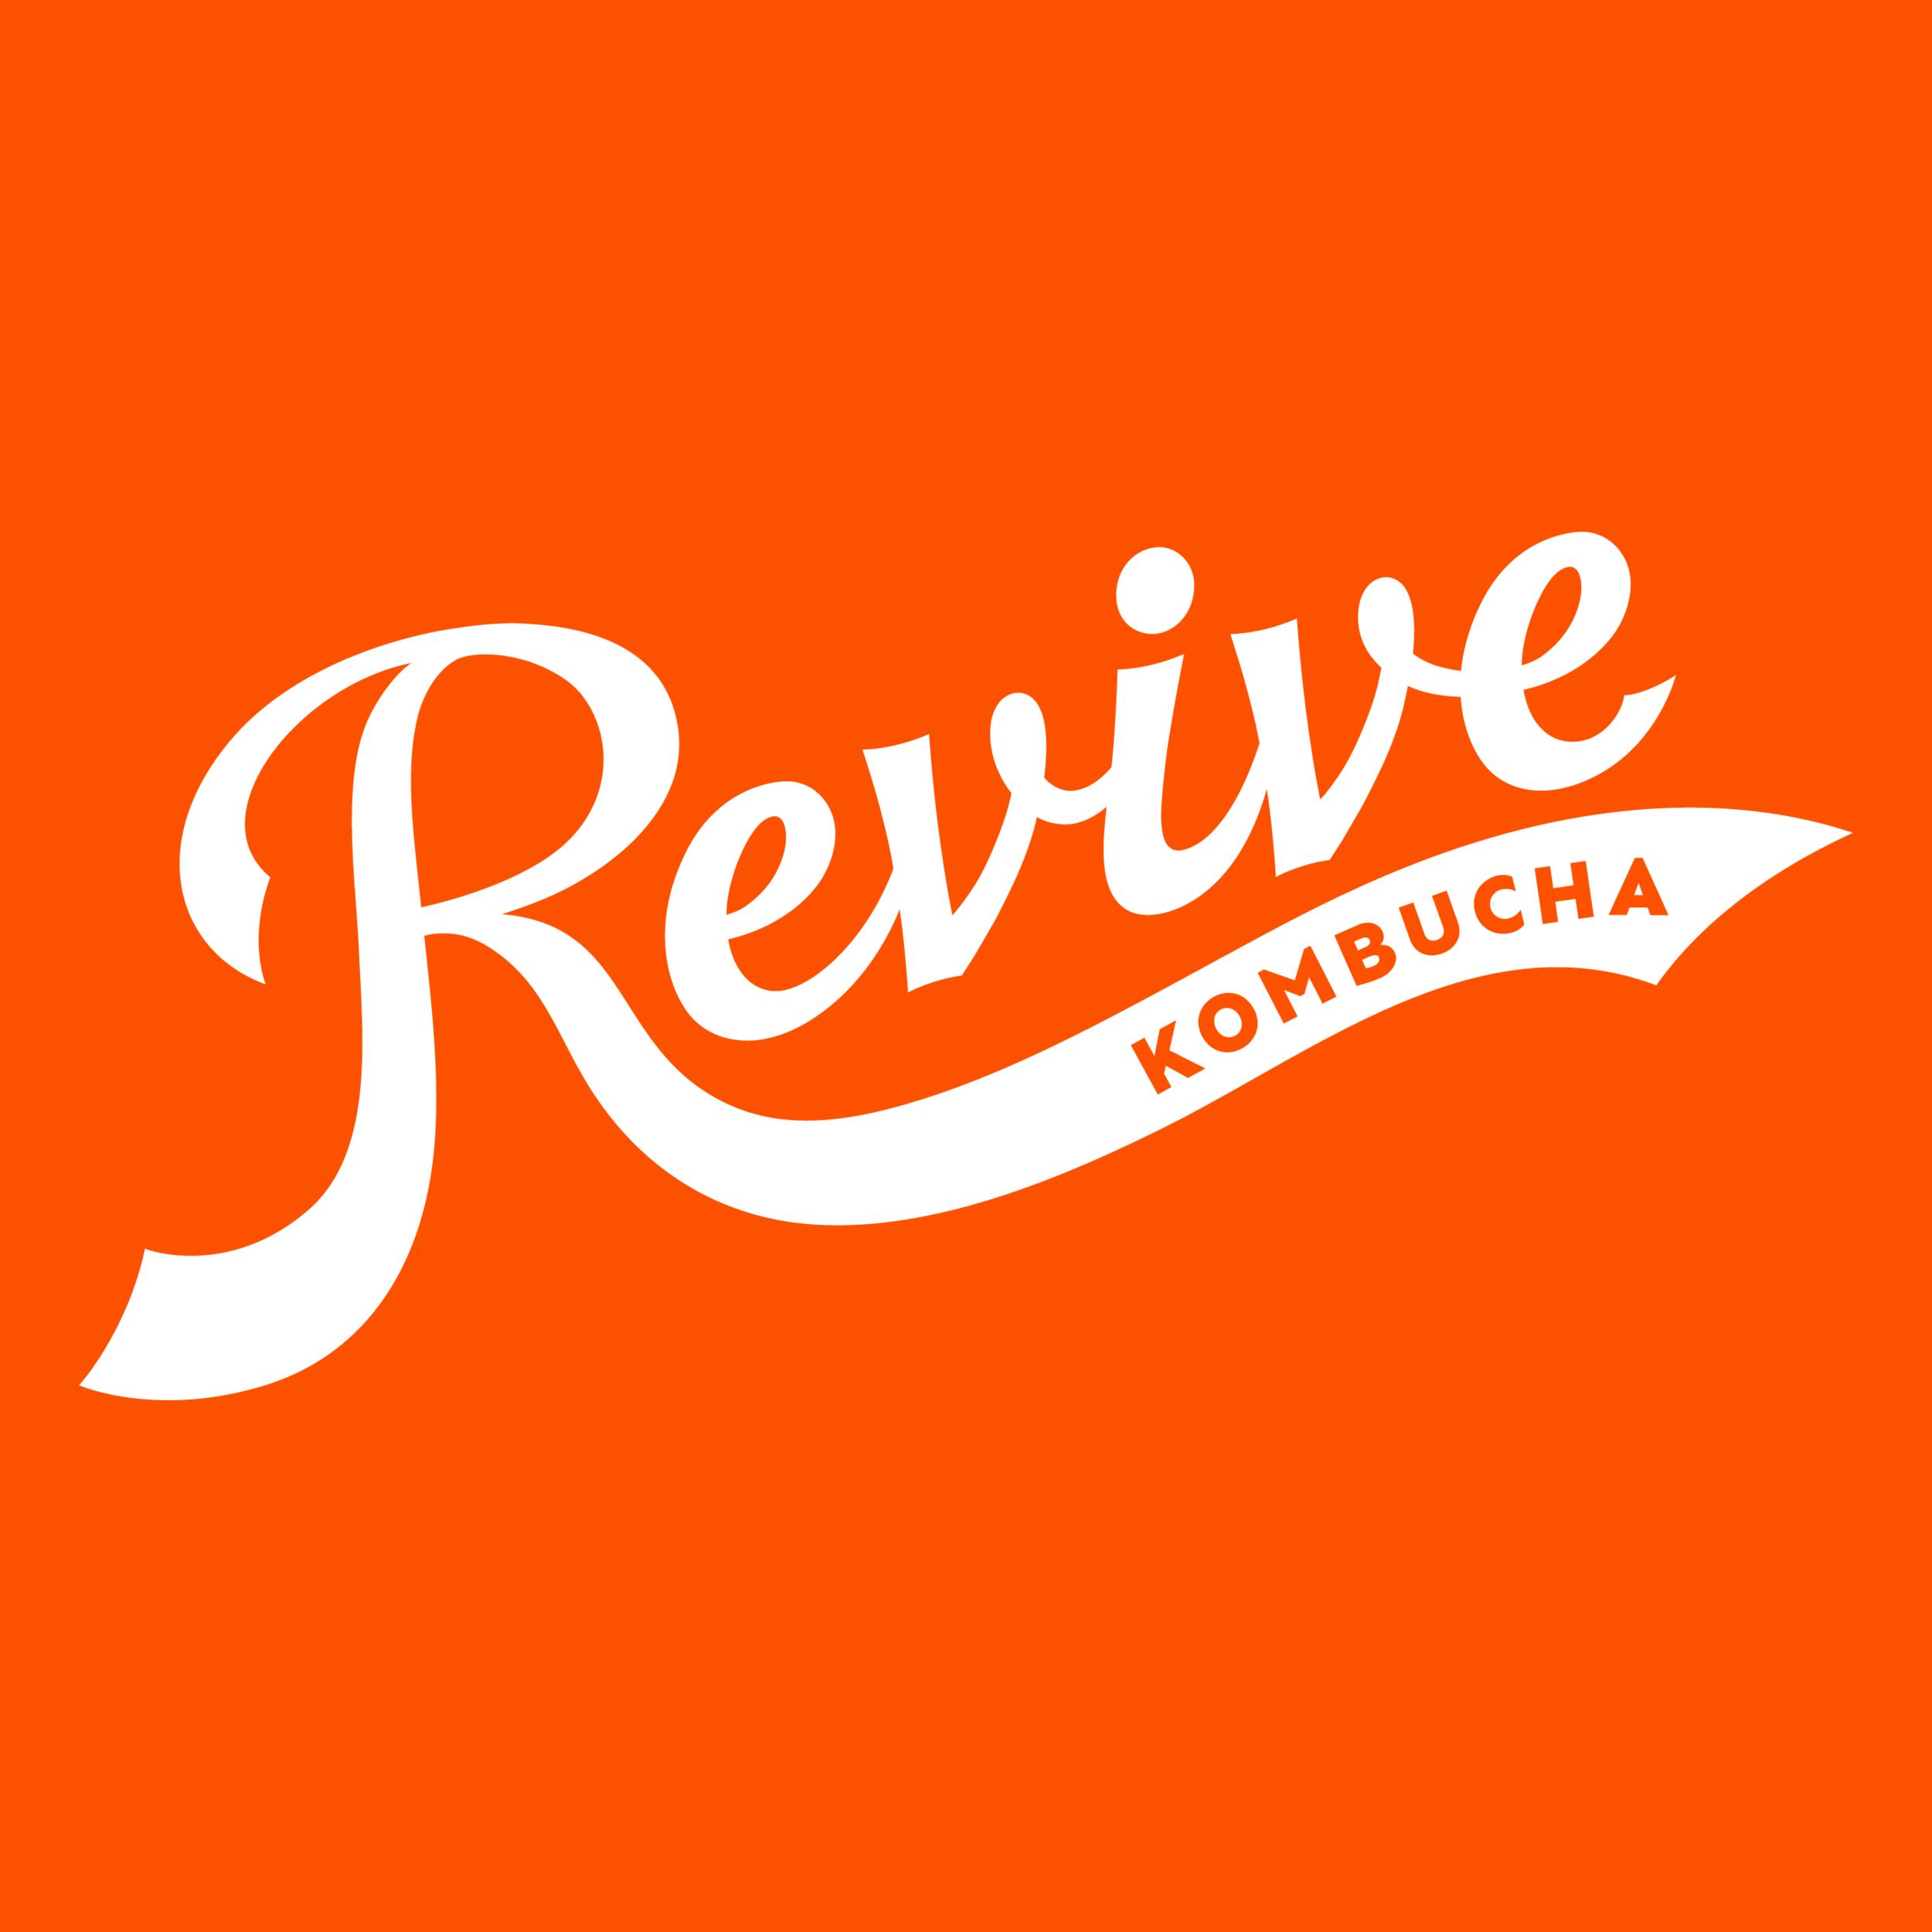 Logo_ReviveKombucha_WhiteOnOrange.png